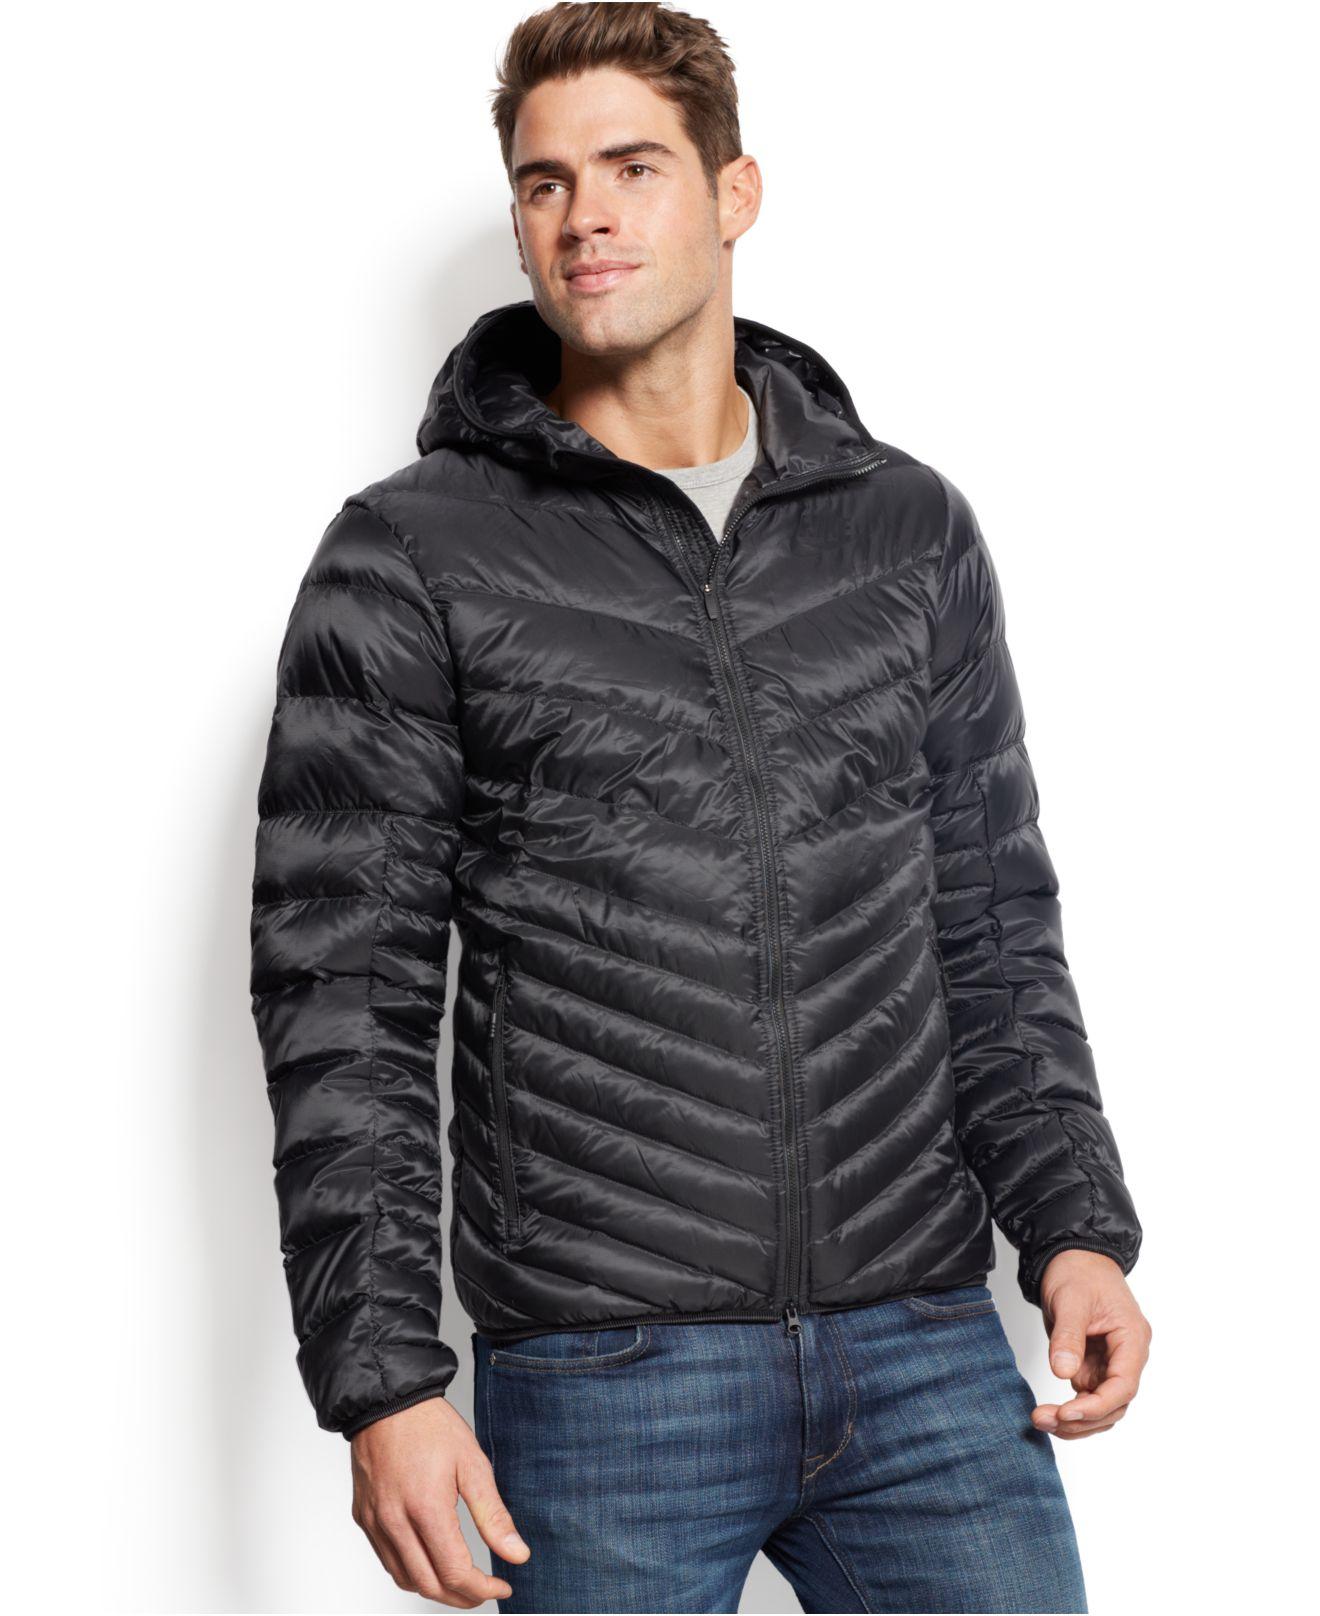 ... Lyst - Nike Cascade Packable Down Jacket in Black for Men hot sale  online 3642c c6071 ... c8df75d6a